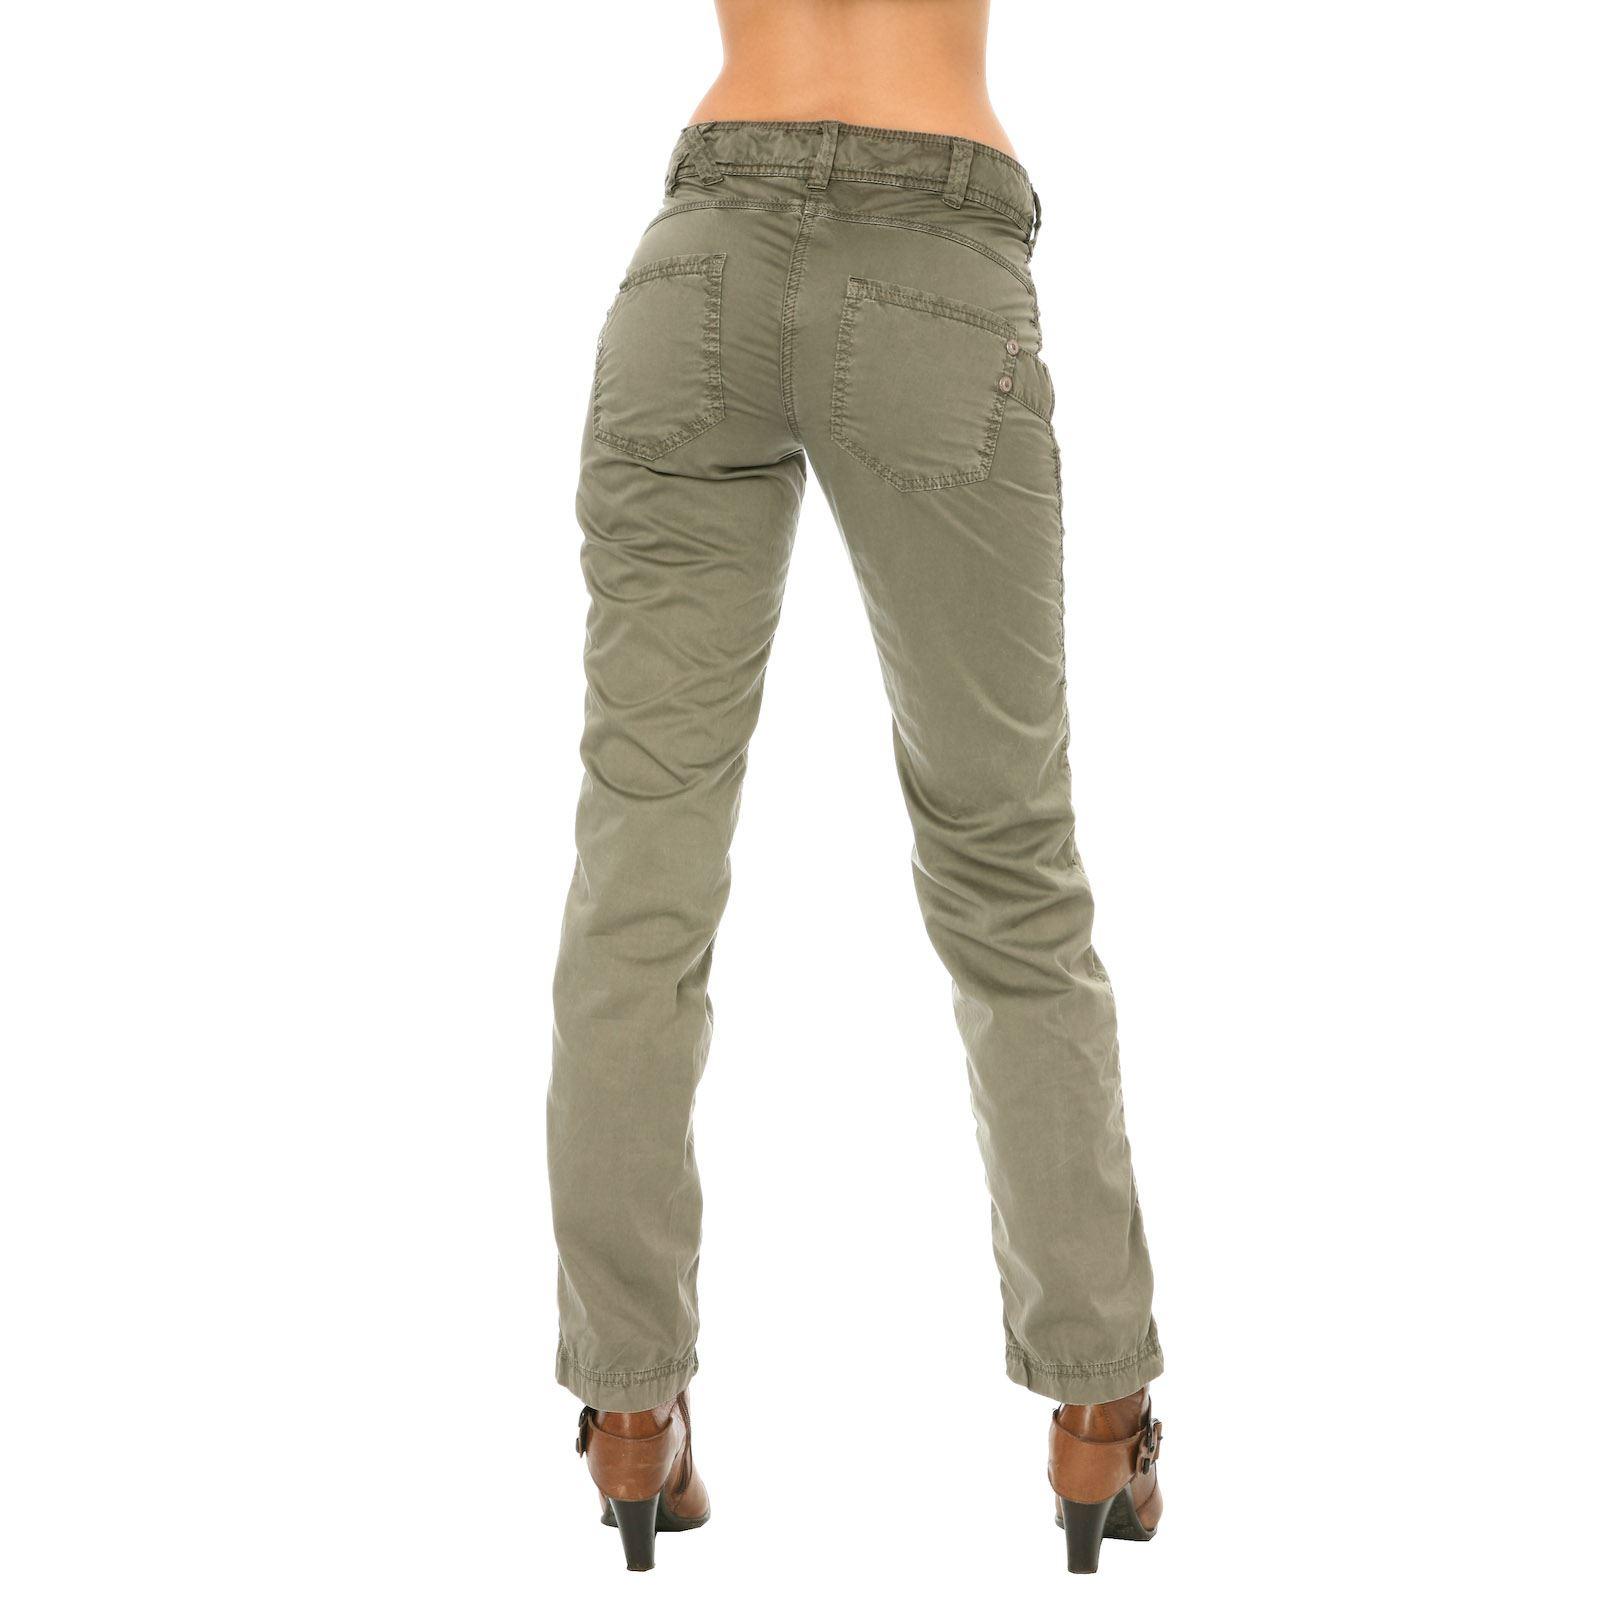 Pantalons / Shirts